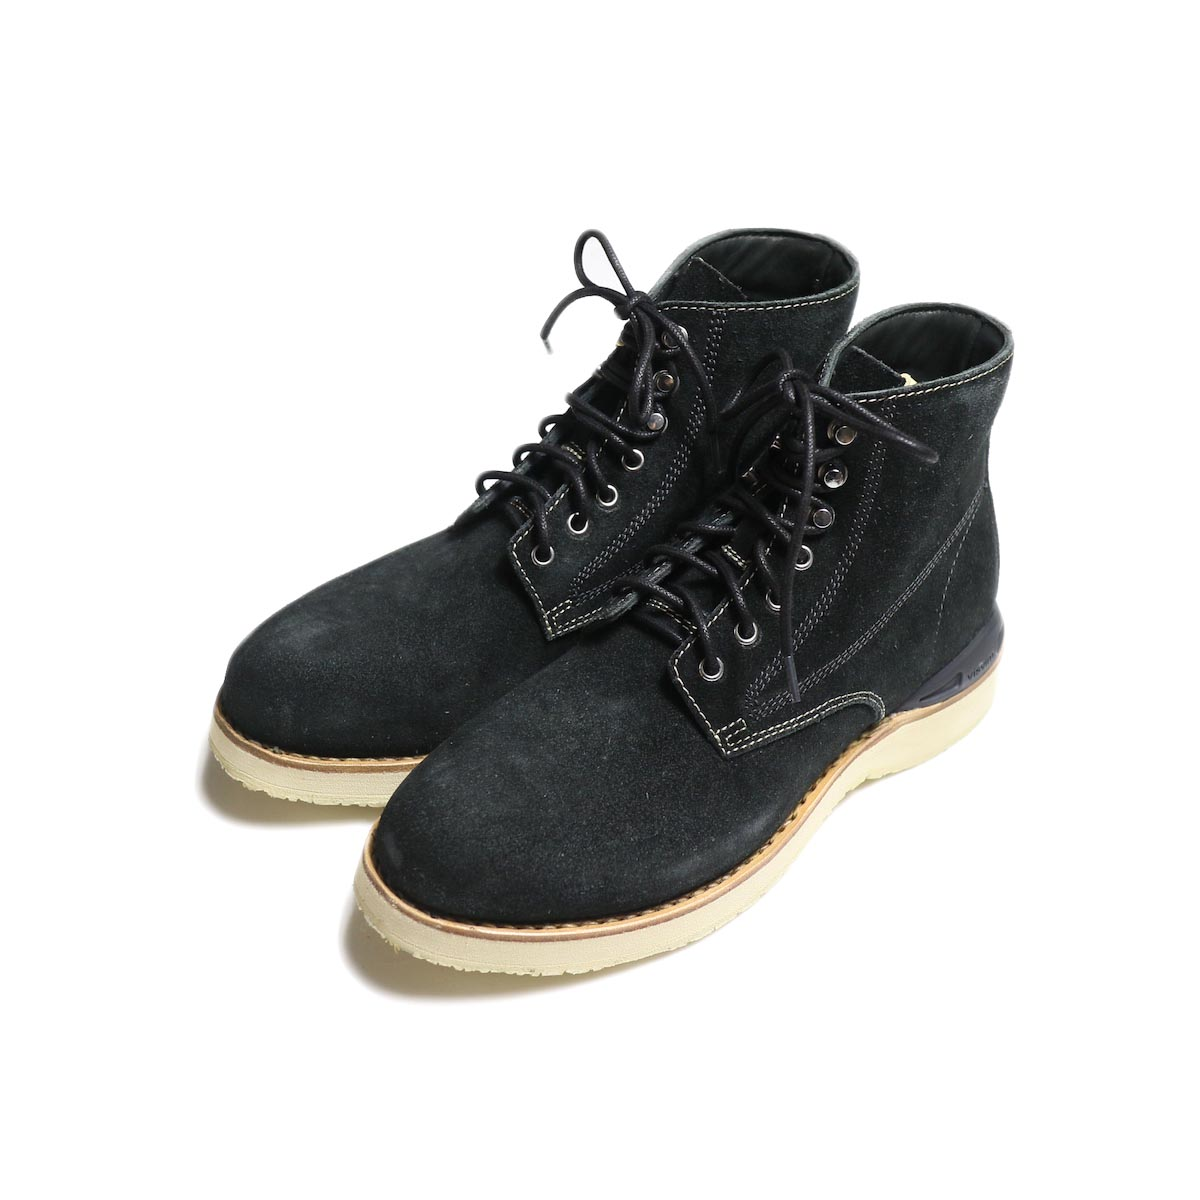 visvim / VIRGIL BOOTS-FOLK (Black)